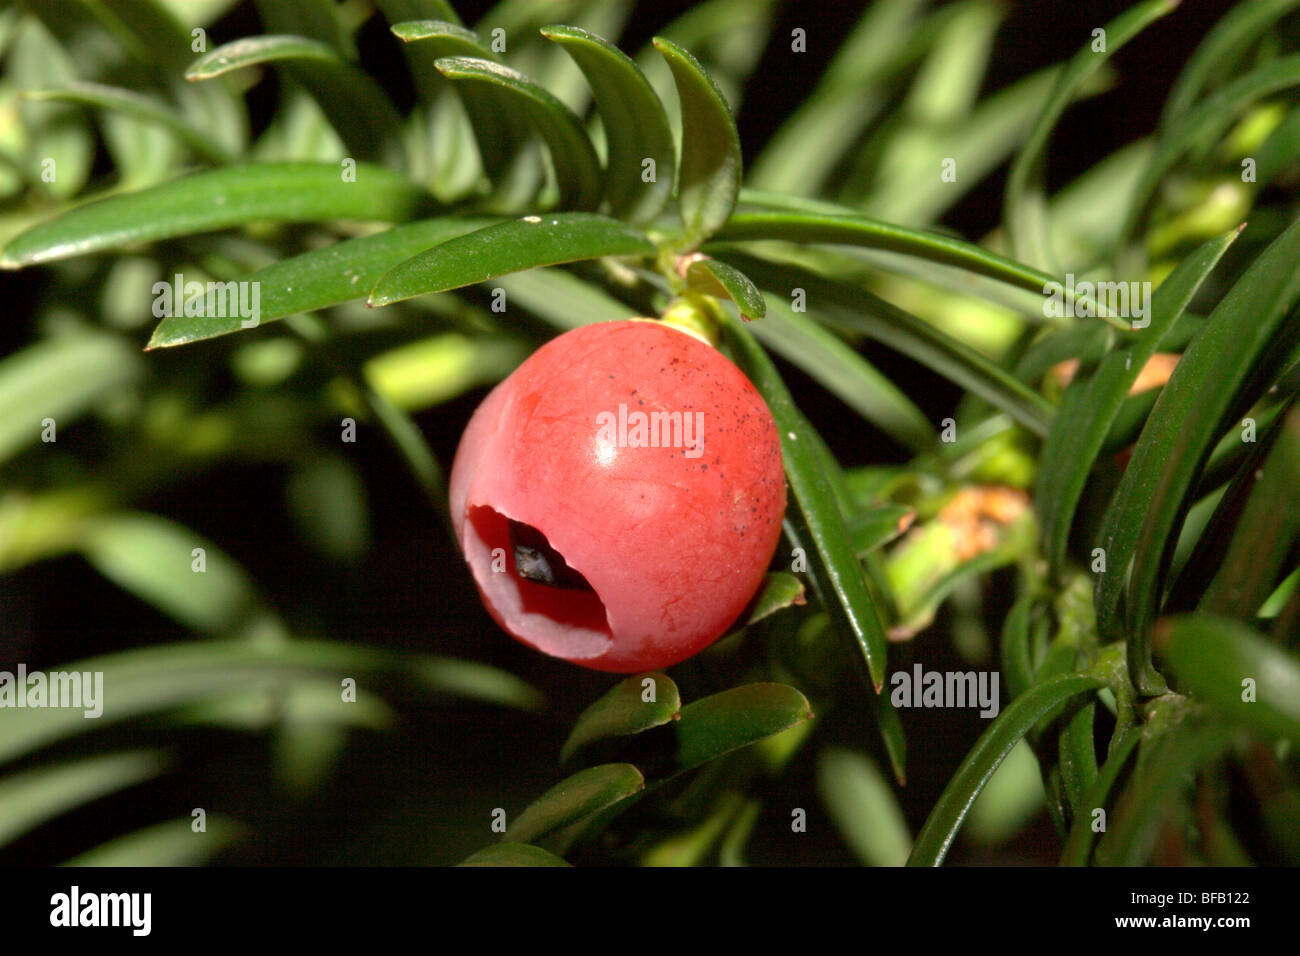 European Yew (Taxus baccata) - Stock Image